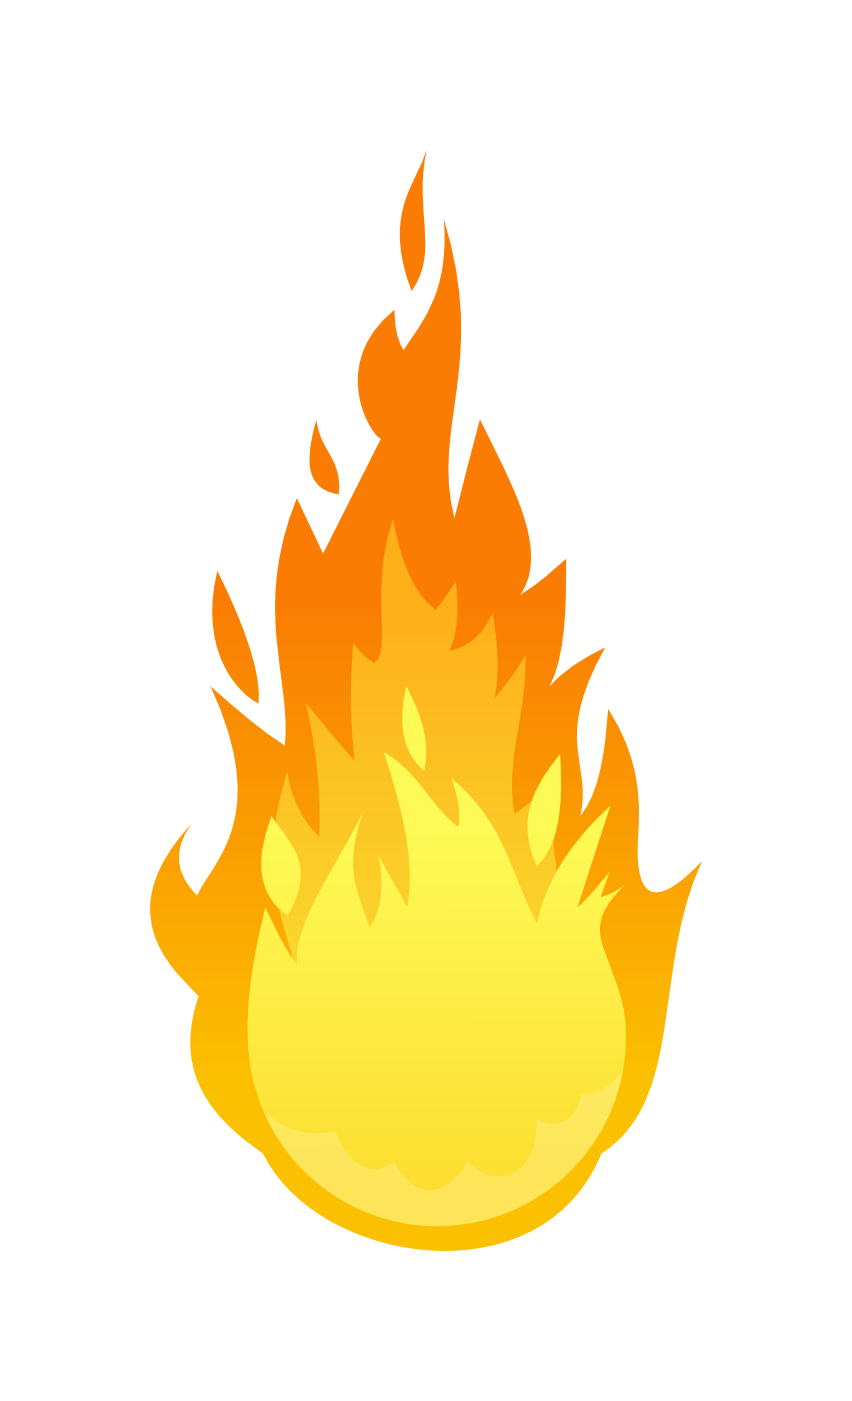 Clipart flames orange flame. Small fire clip art